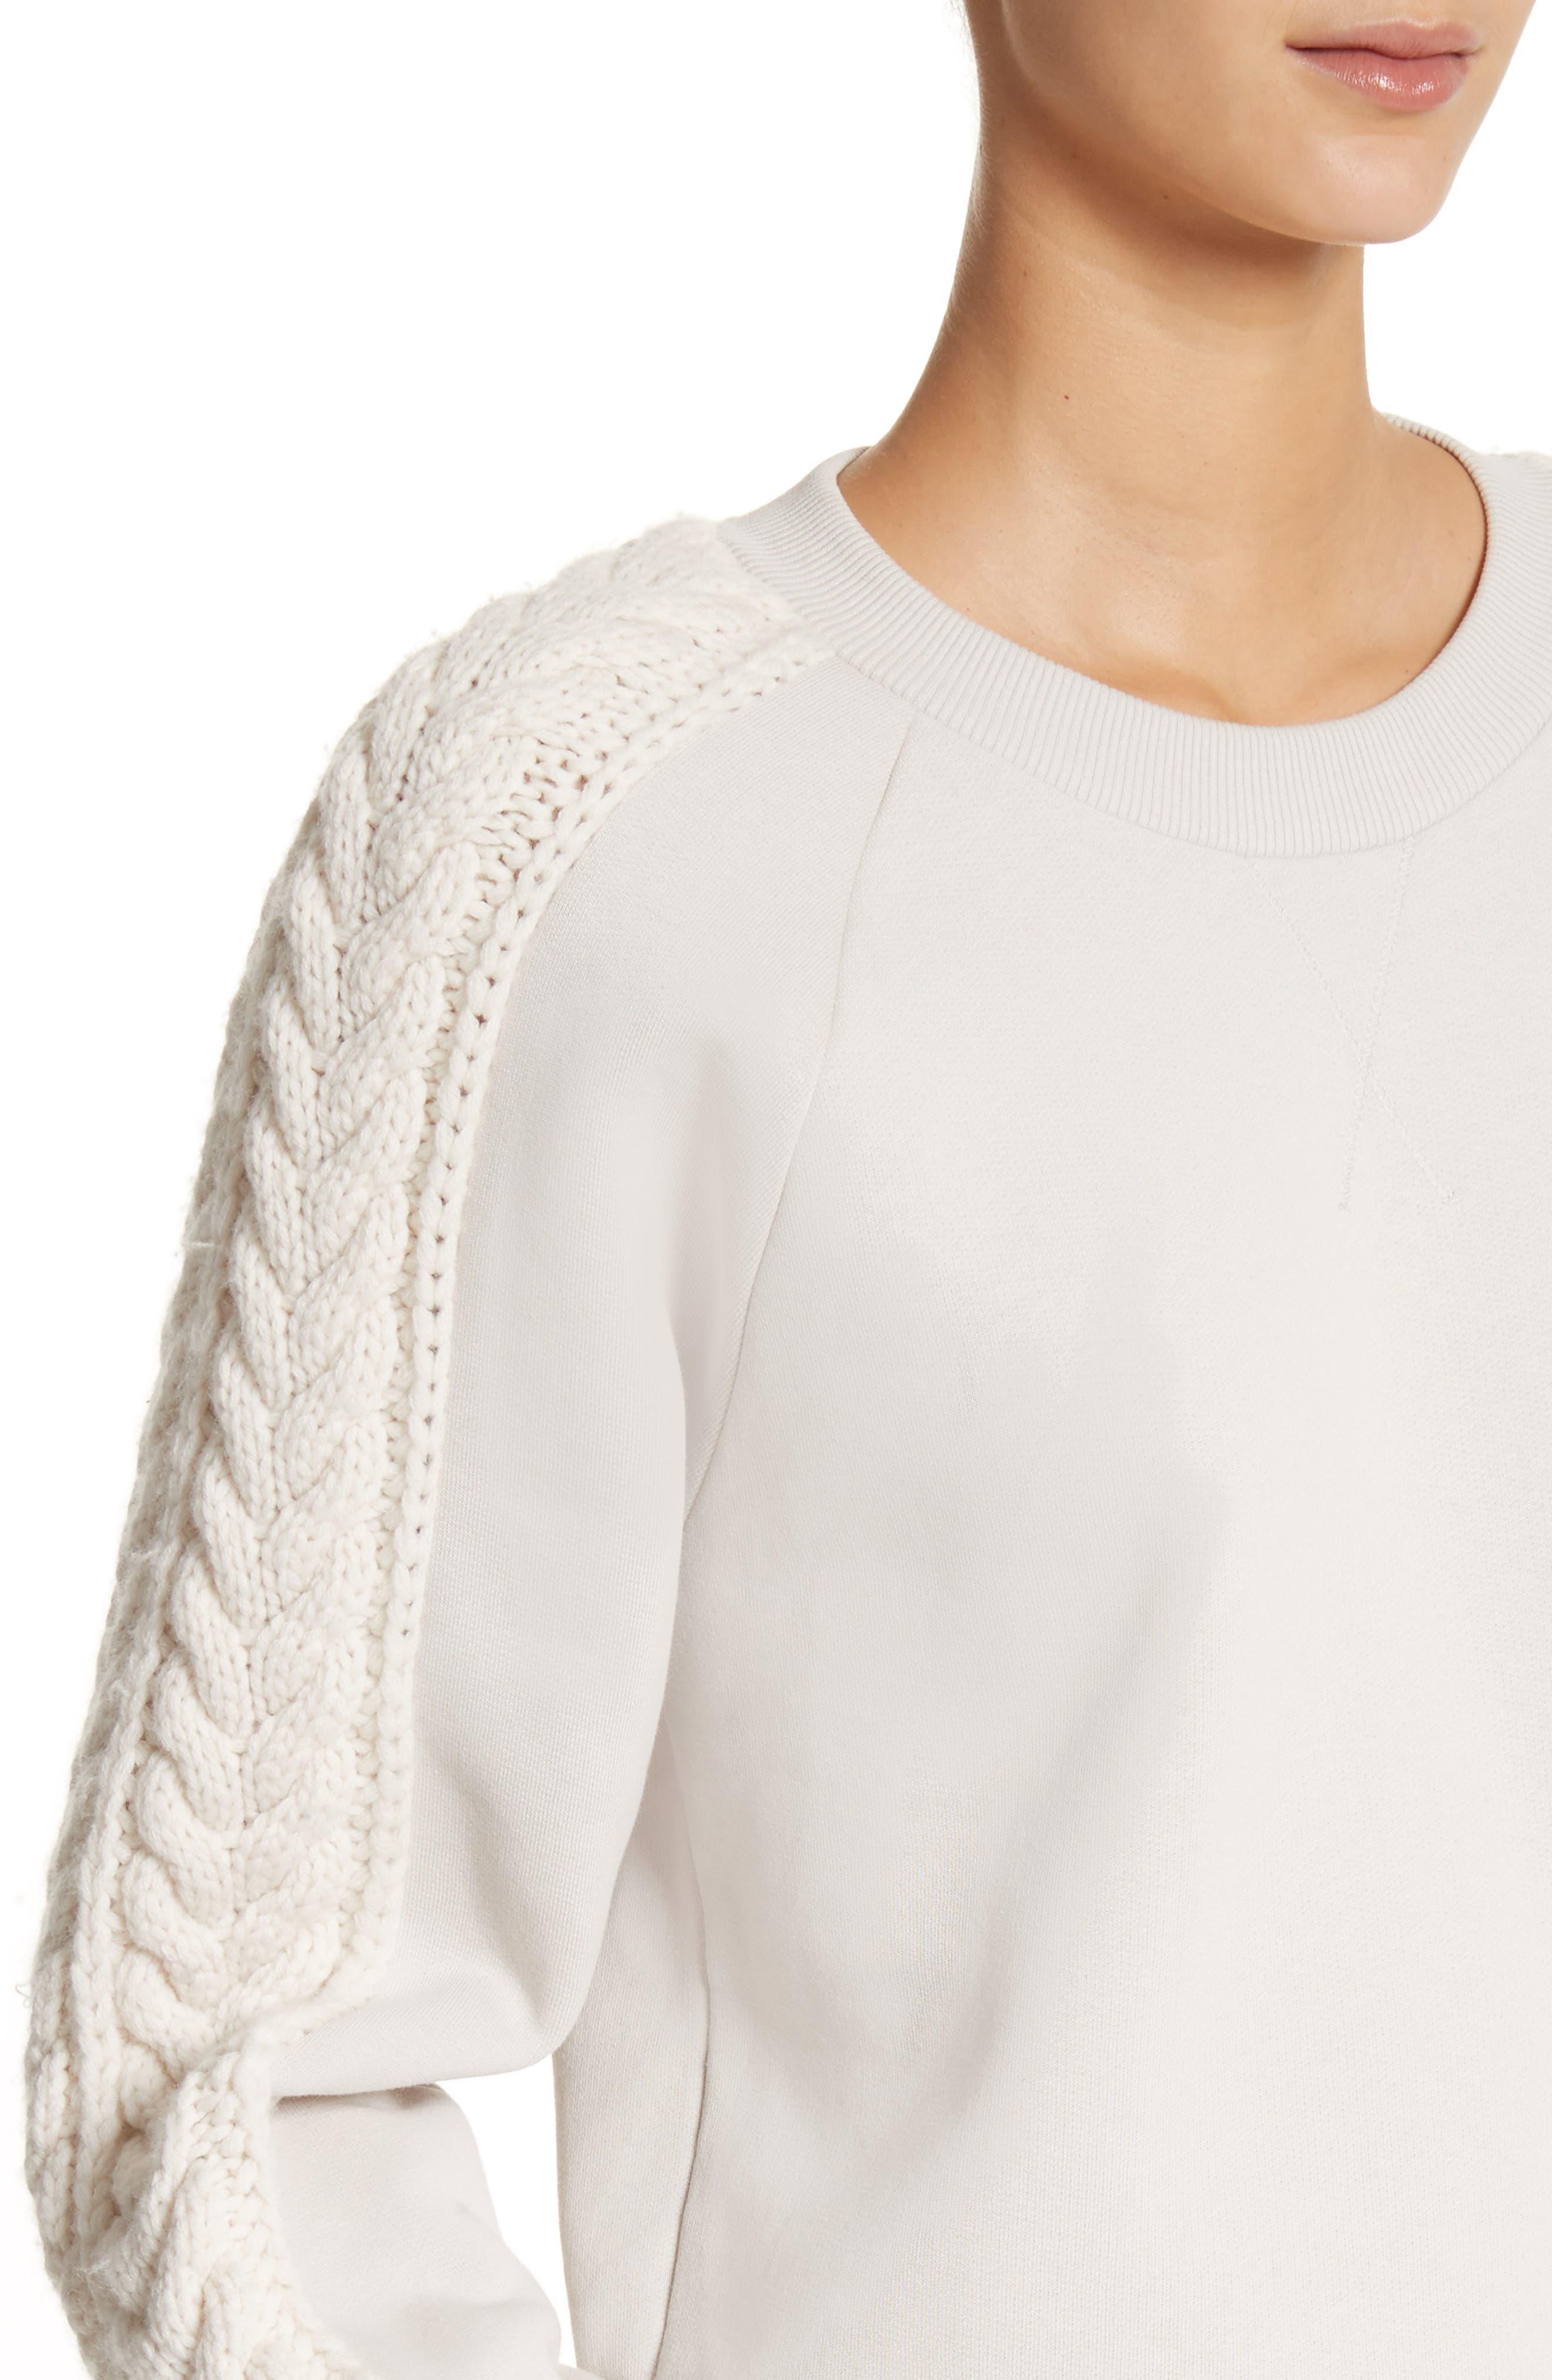 Selho Sweatshirt,                             Alternate thumbnail 4, color,                             Winter White